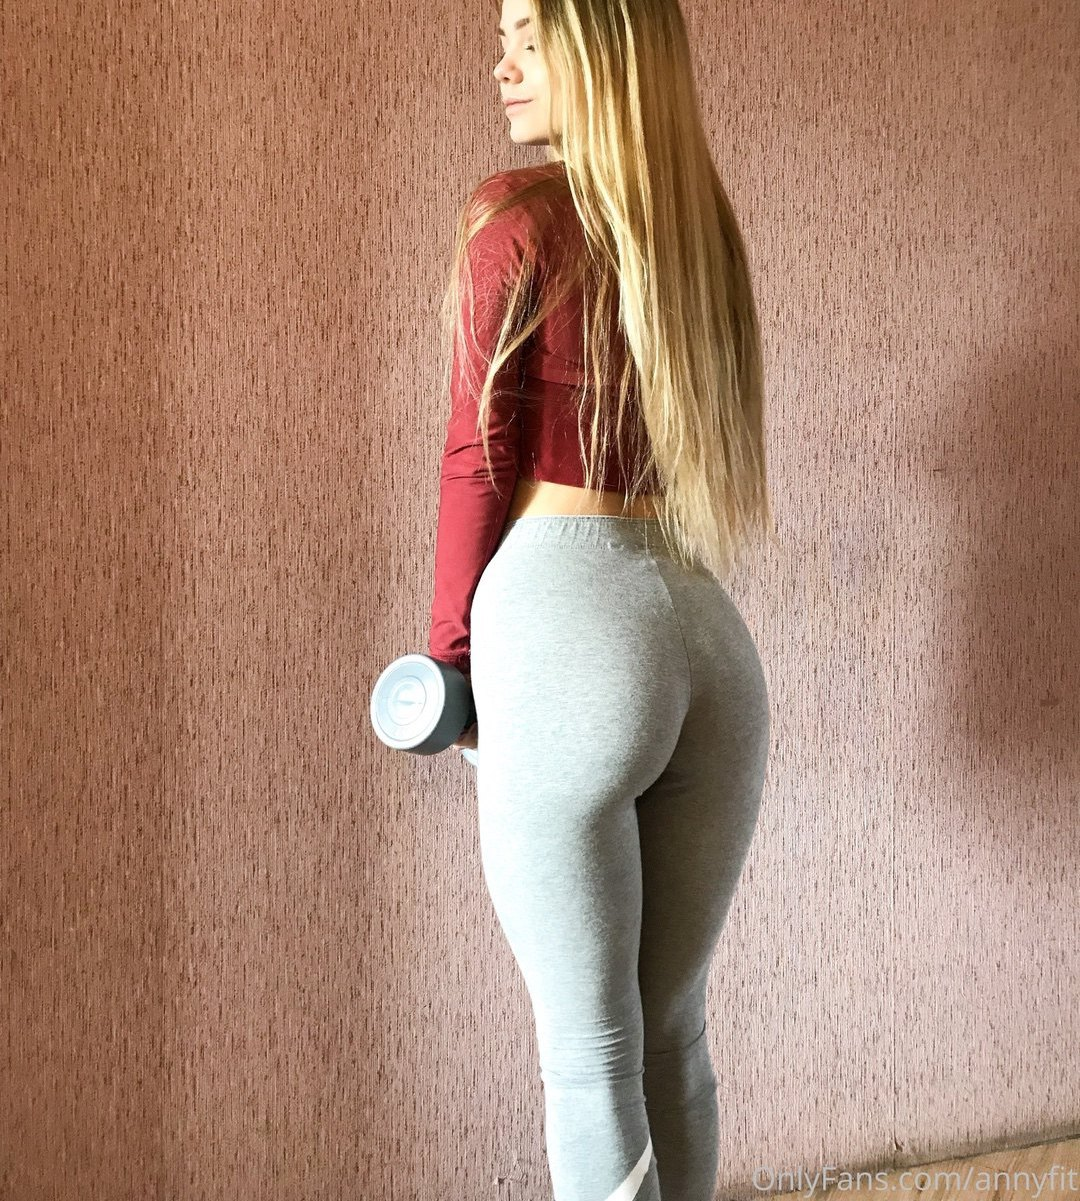 Annija Roga Annyfit Onlyfans Sexy Leaks 0028